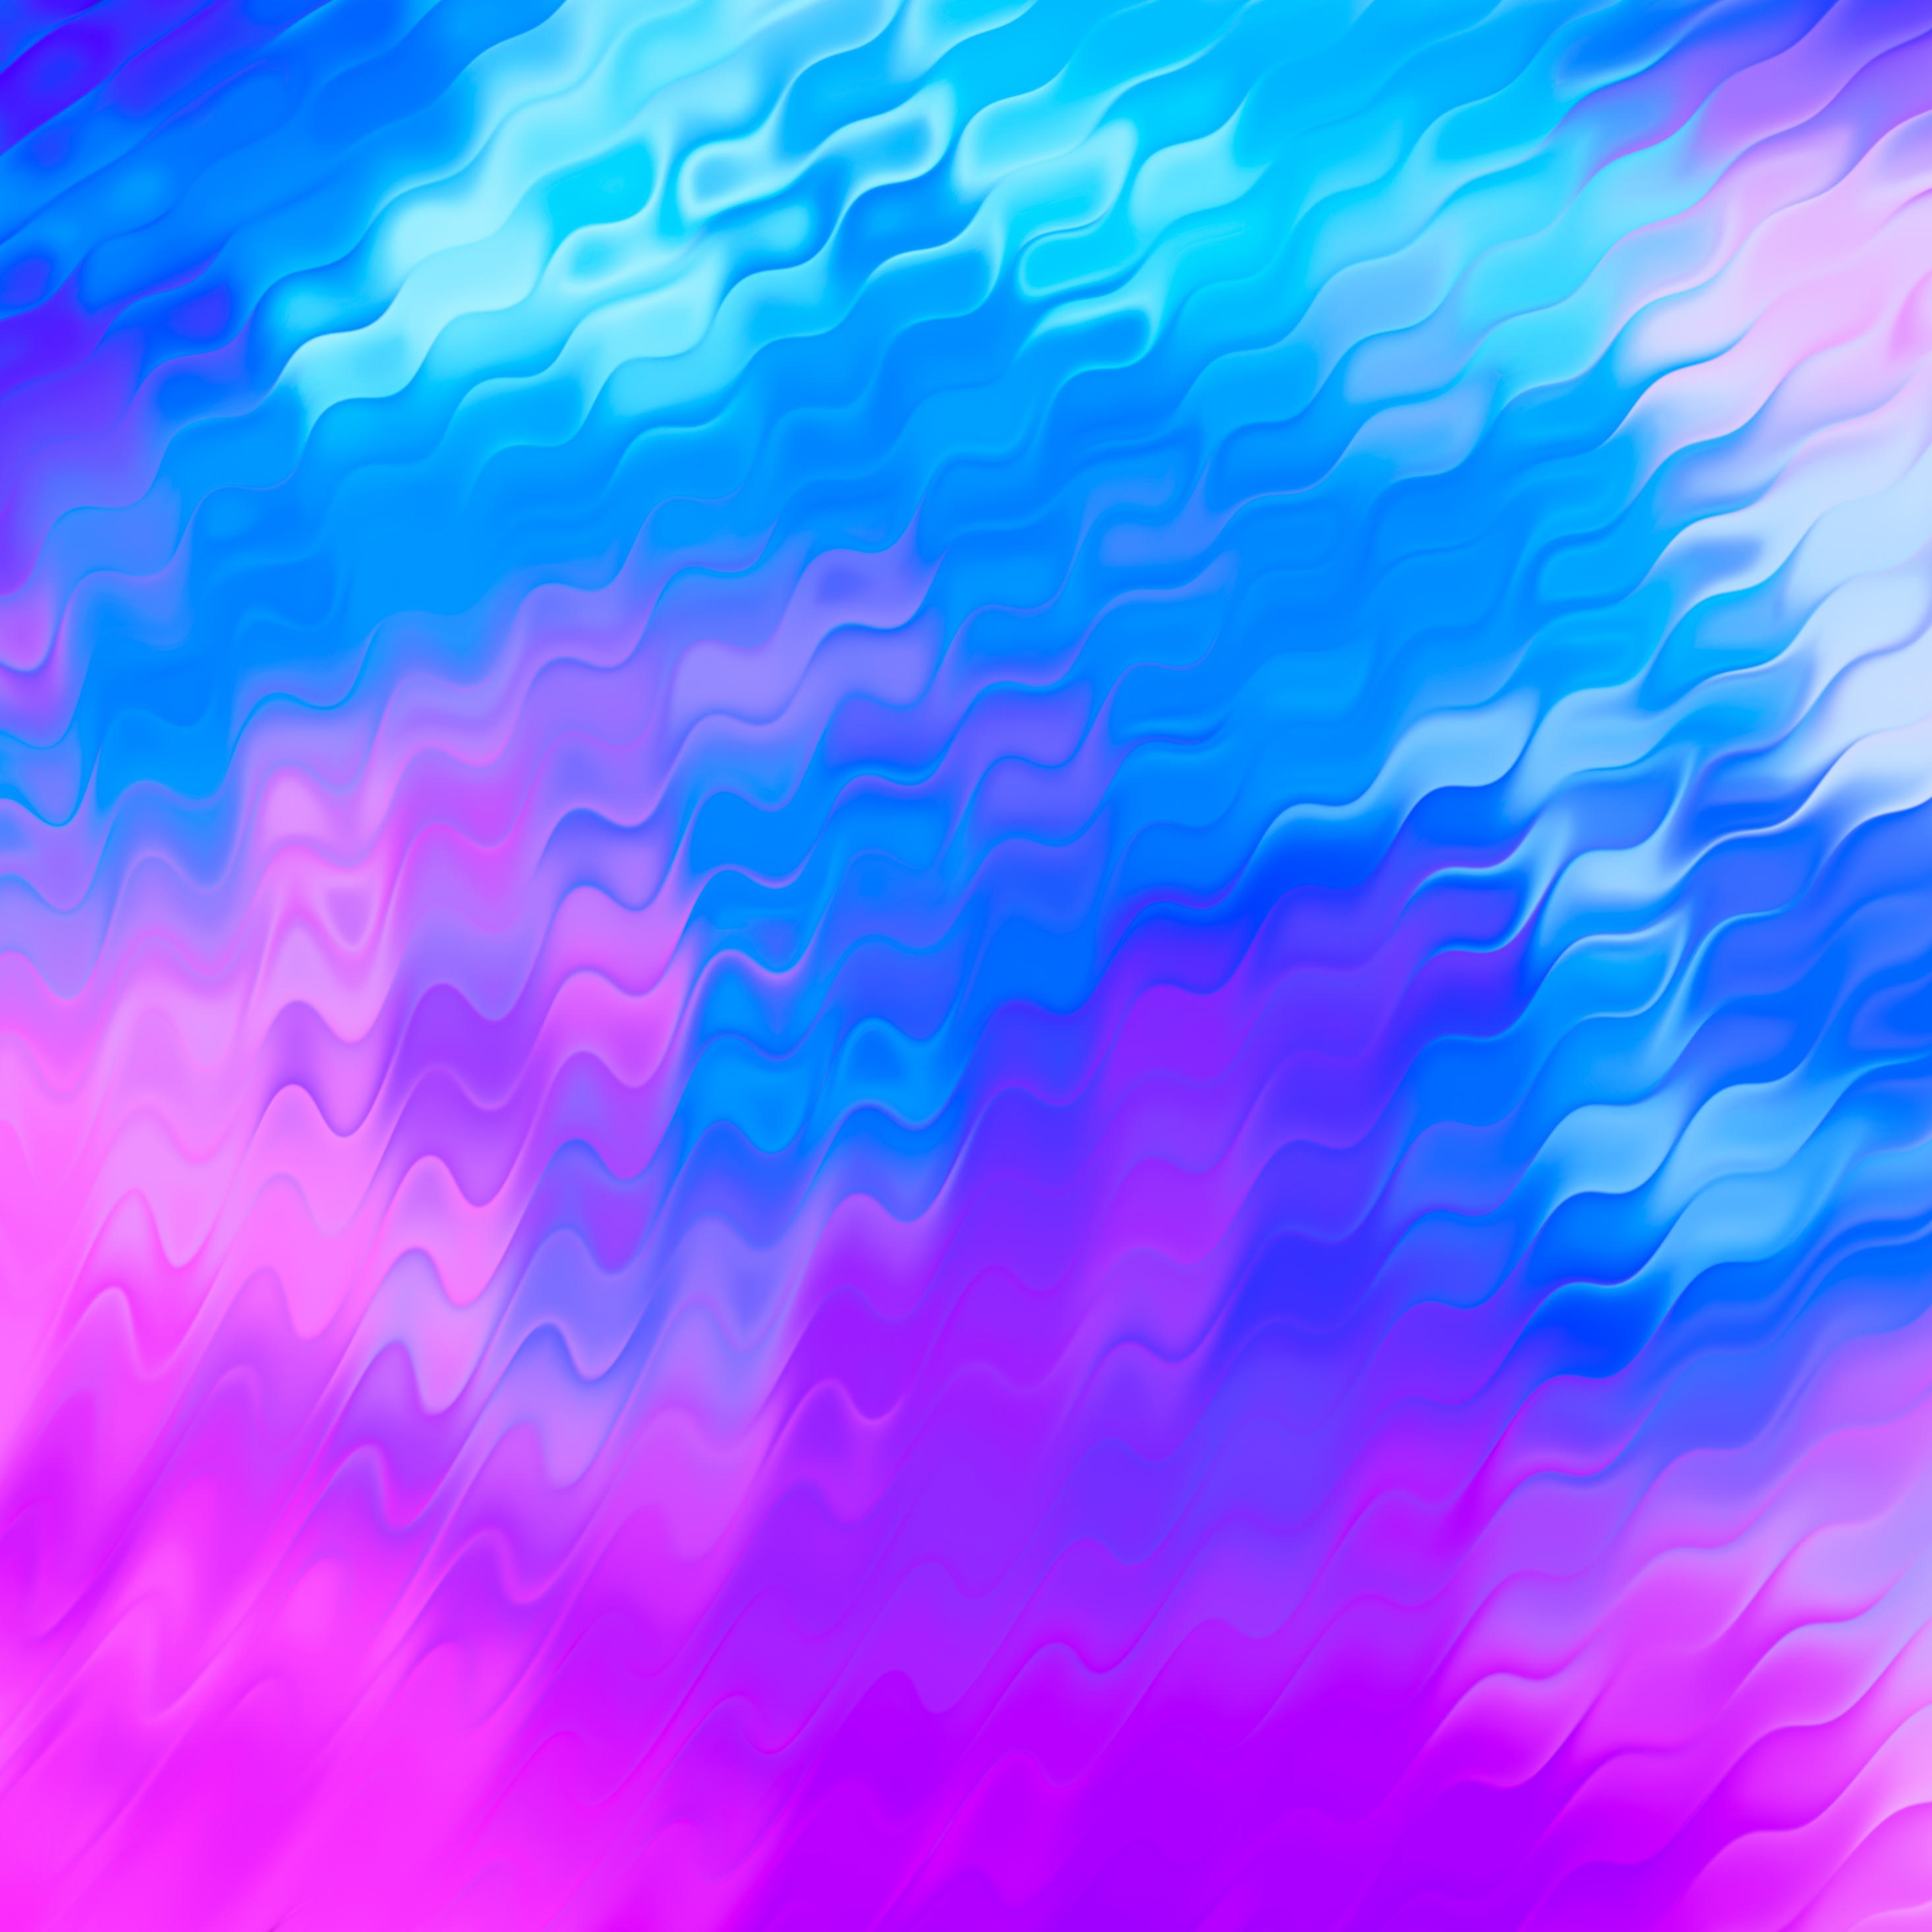 2932x2932 Pink Blue Shapes Abstract 4k Ipad Pro Retina